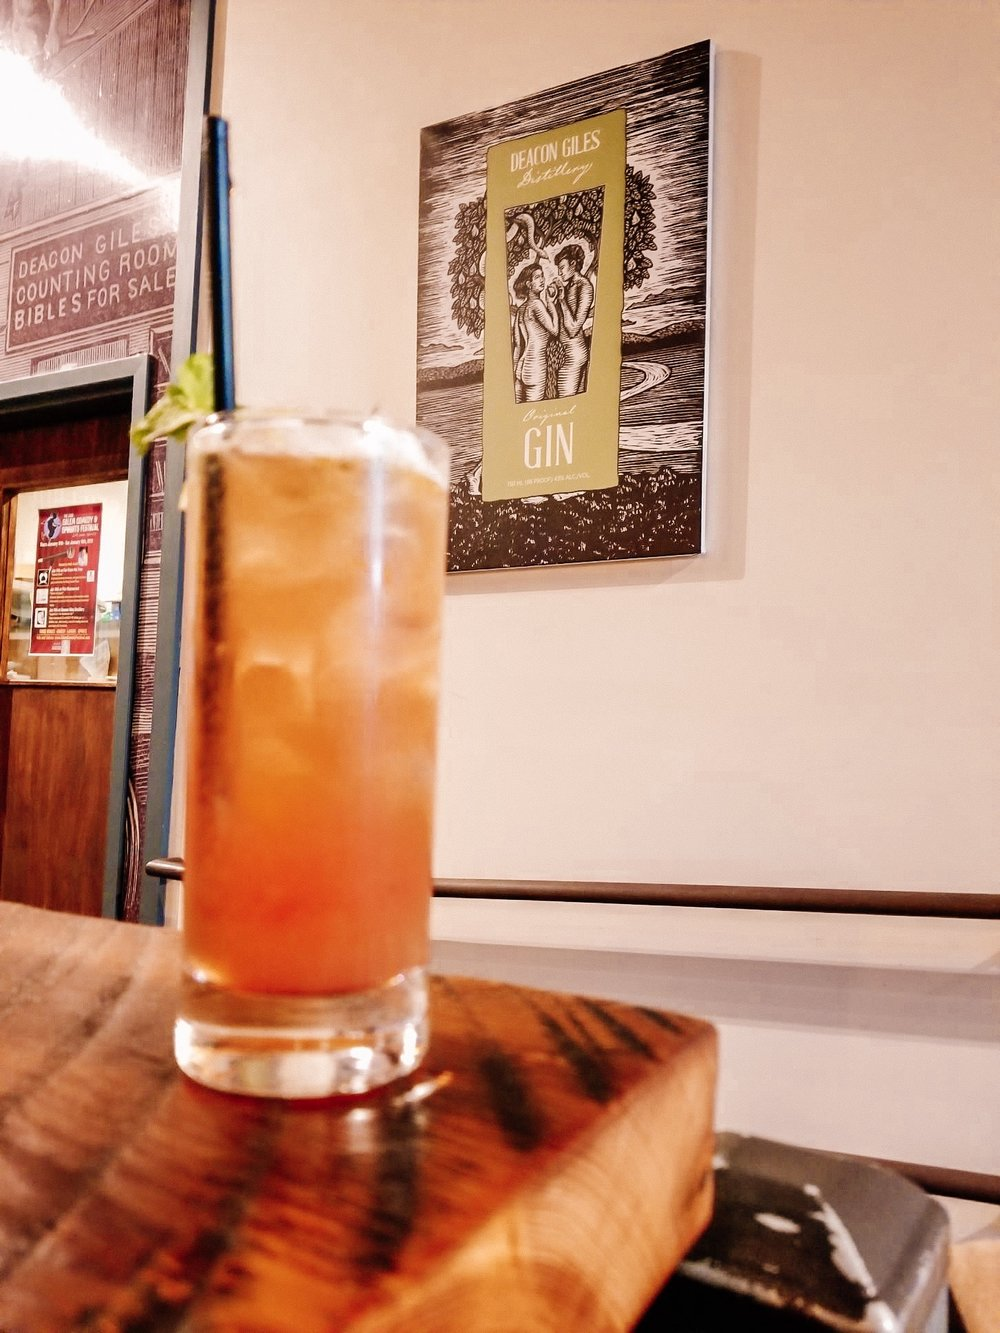 Mocktail at Deacon Giles distillery in Salem Massachusetts